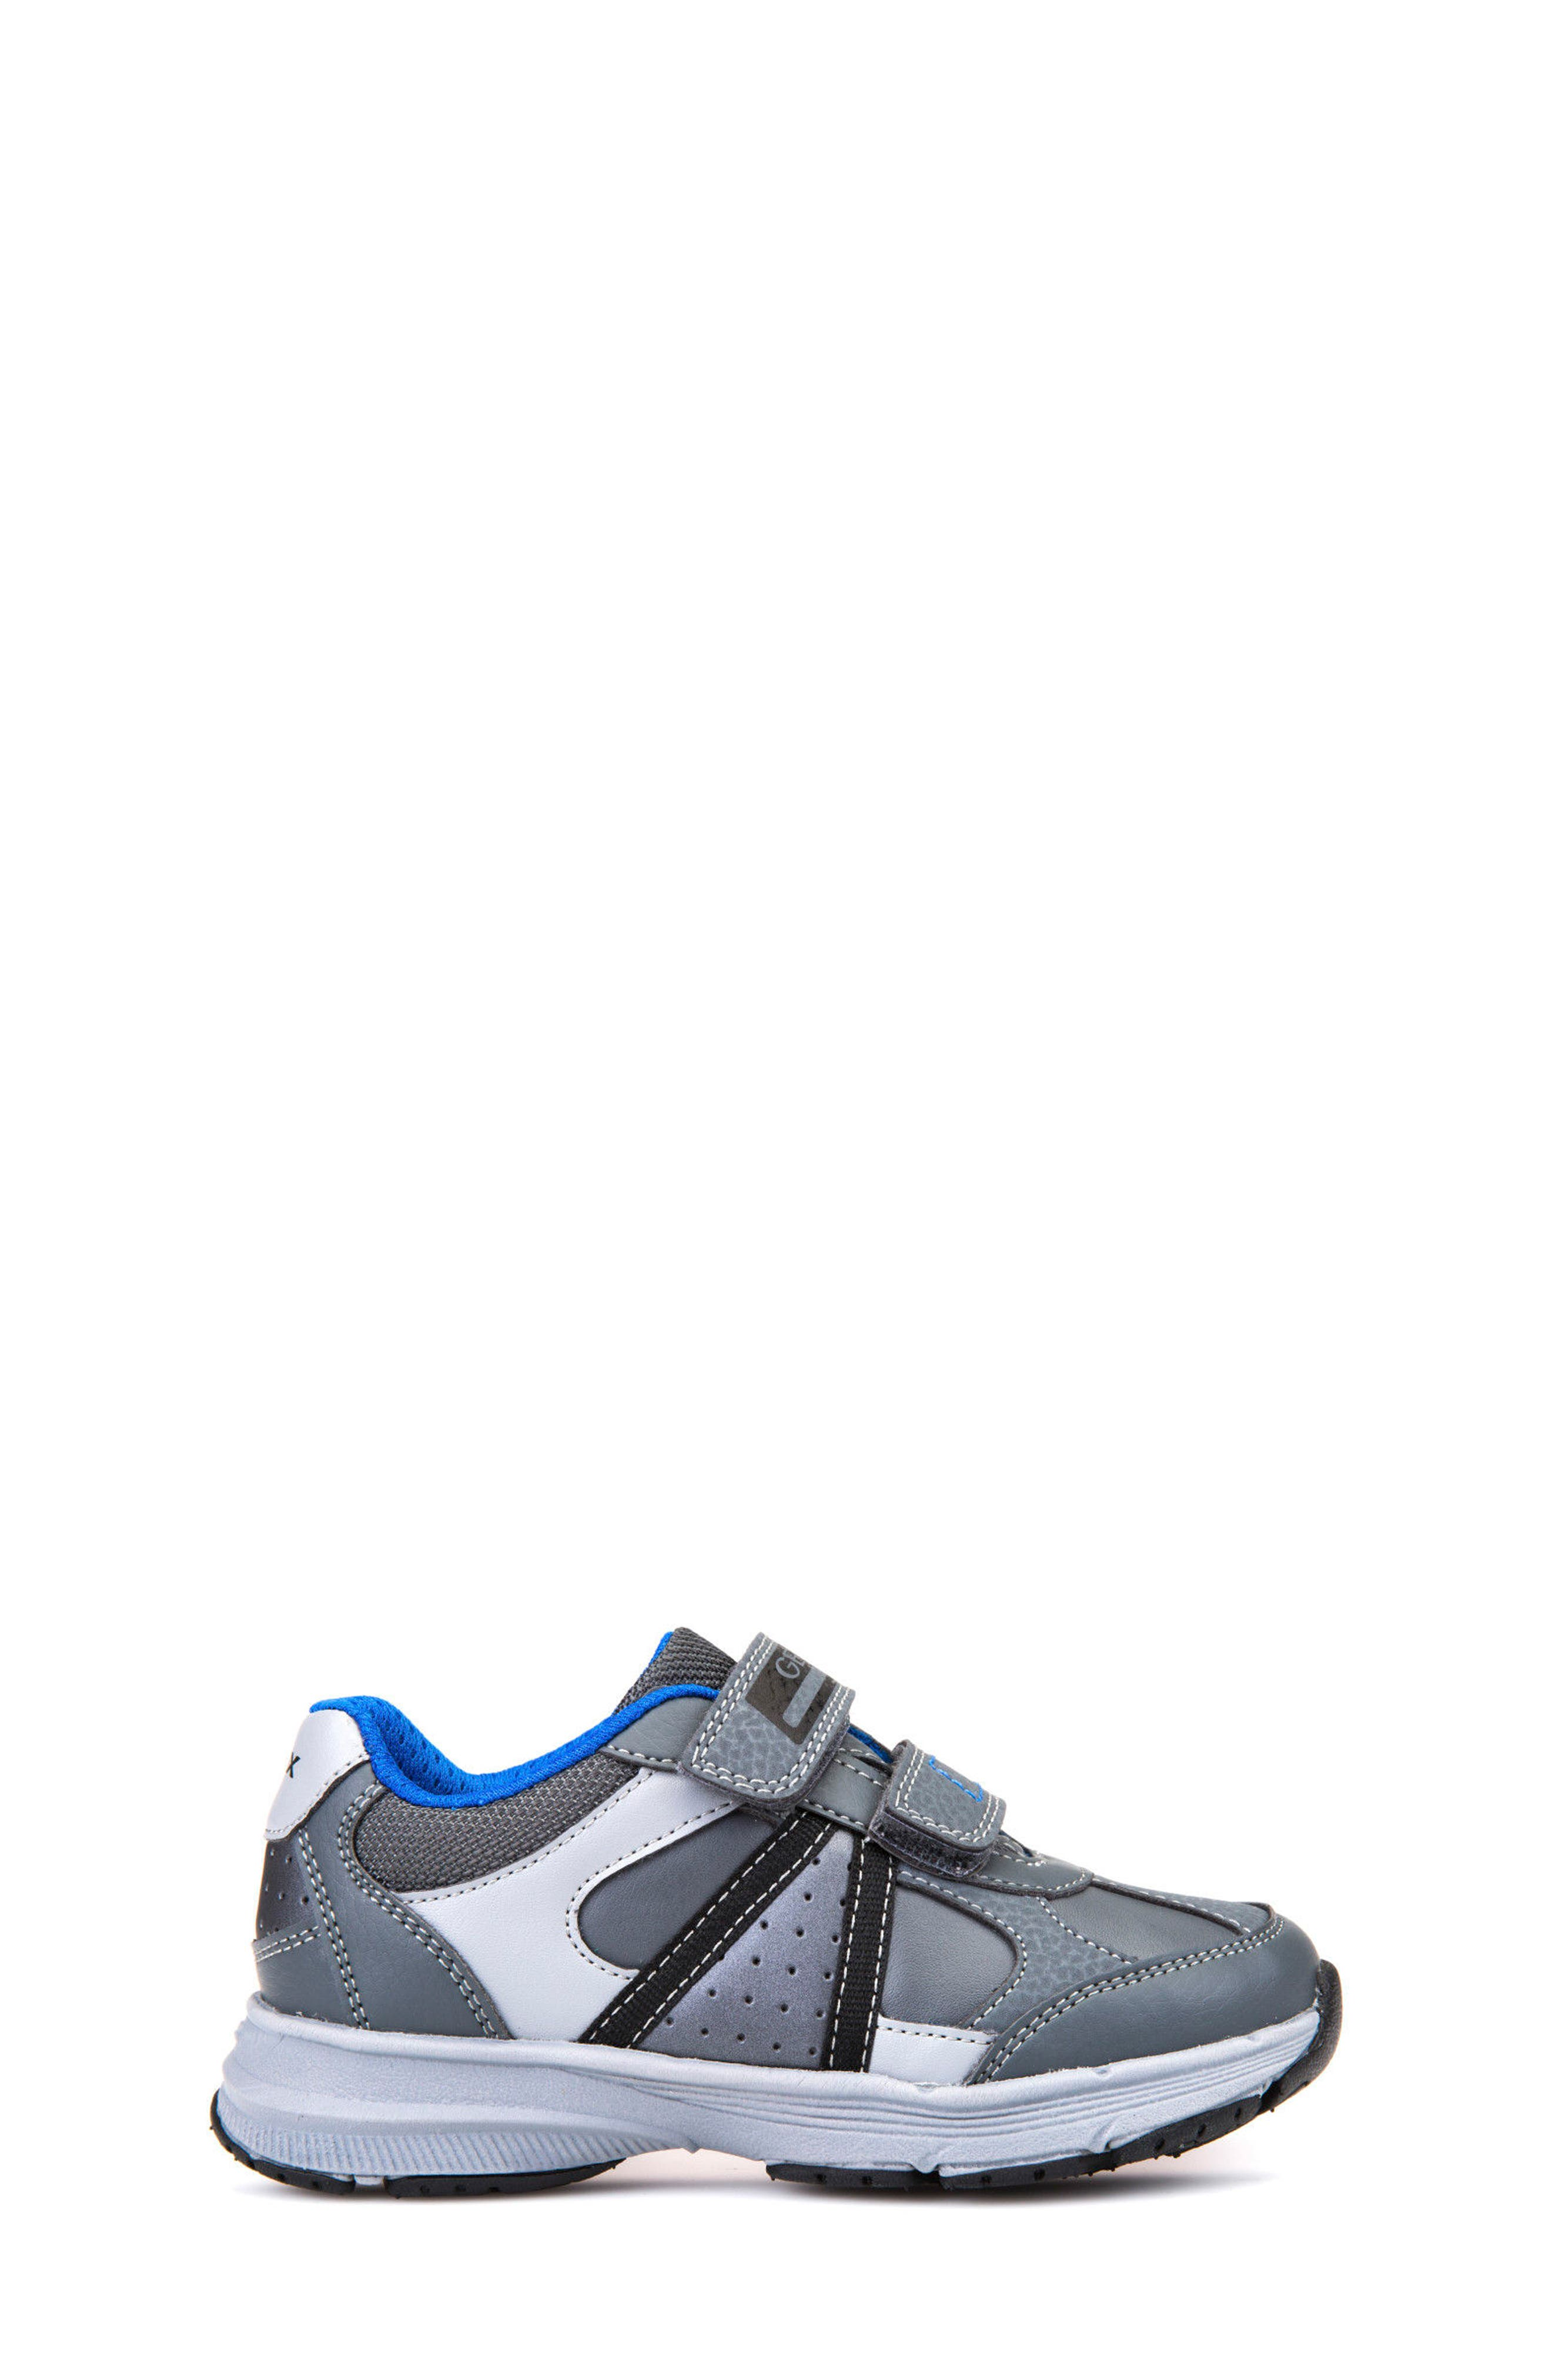 Top Fly Sneaker,                             Alternate thumbnail 7, color,